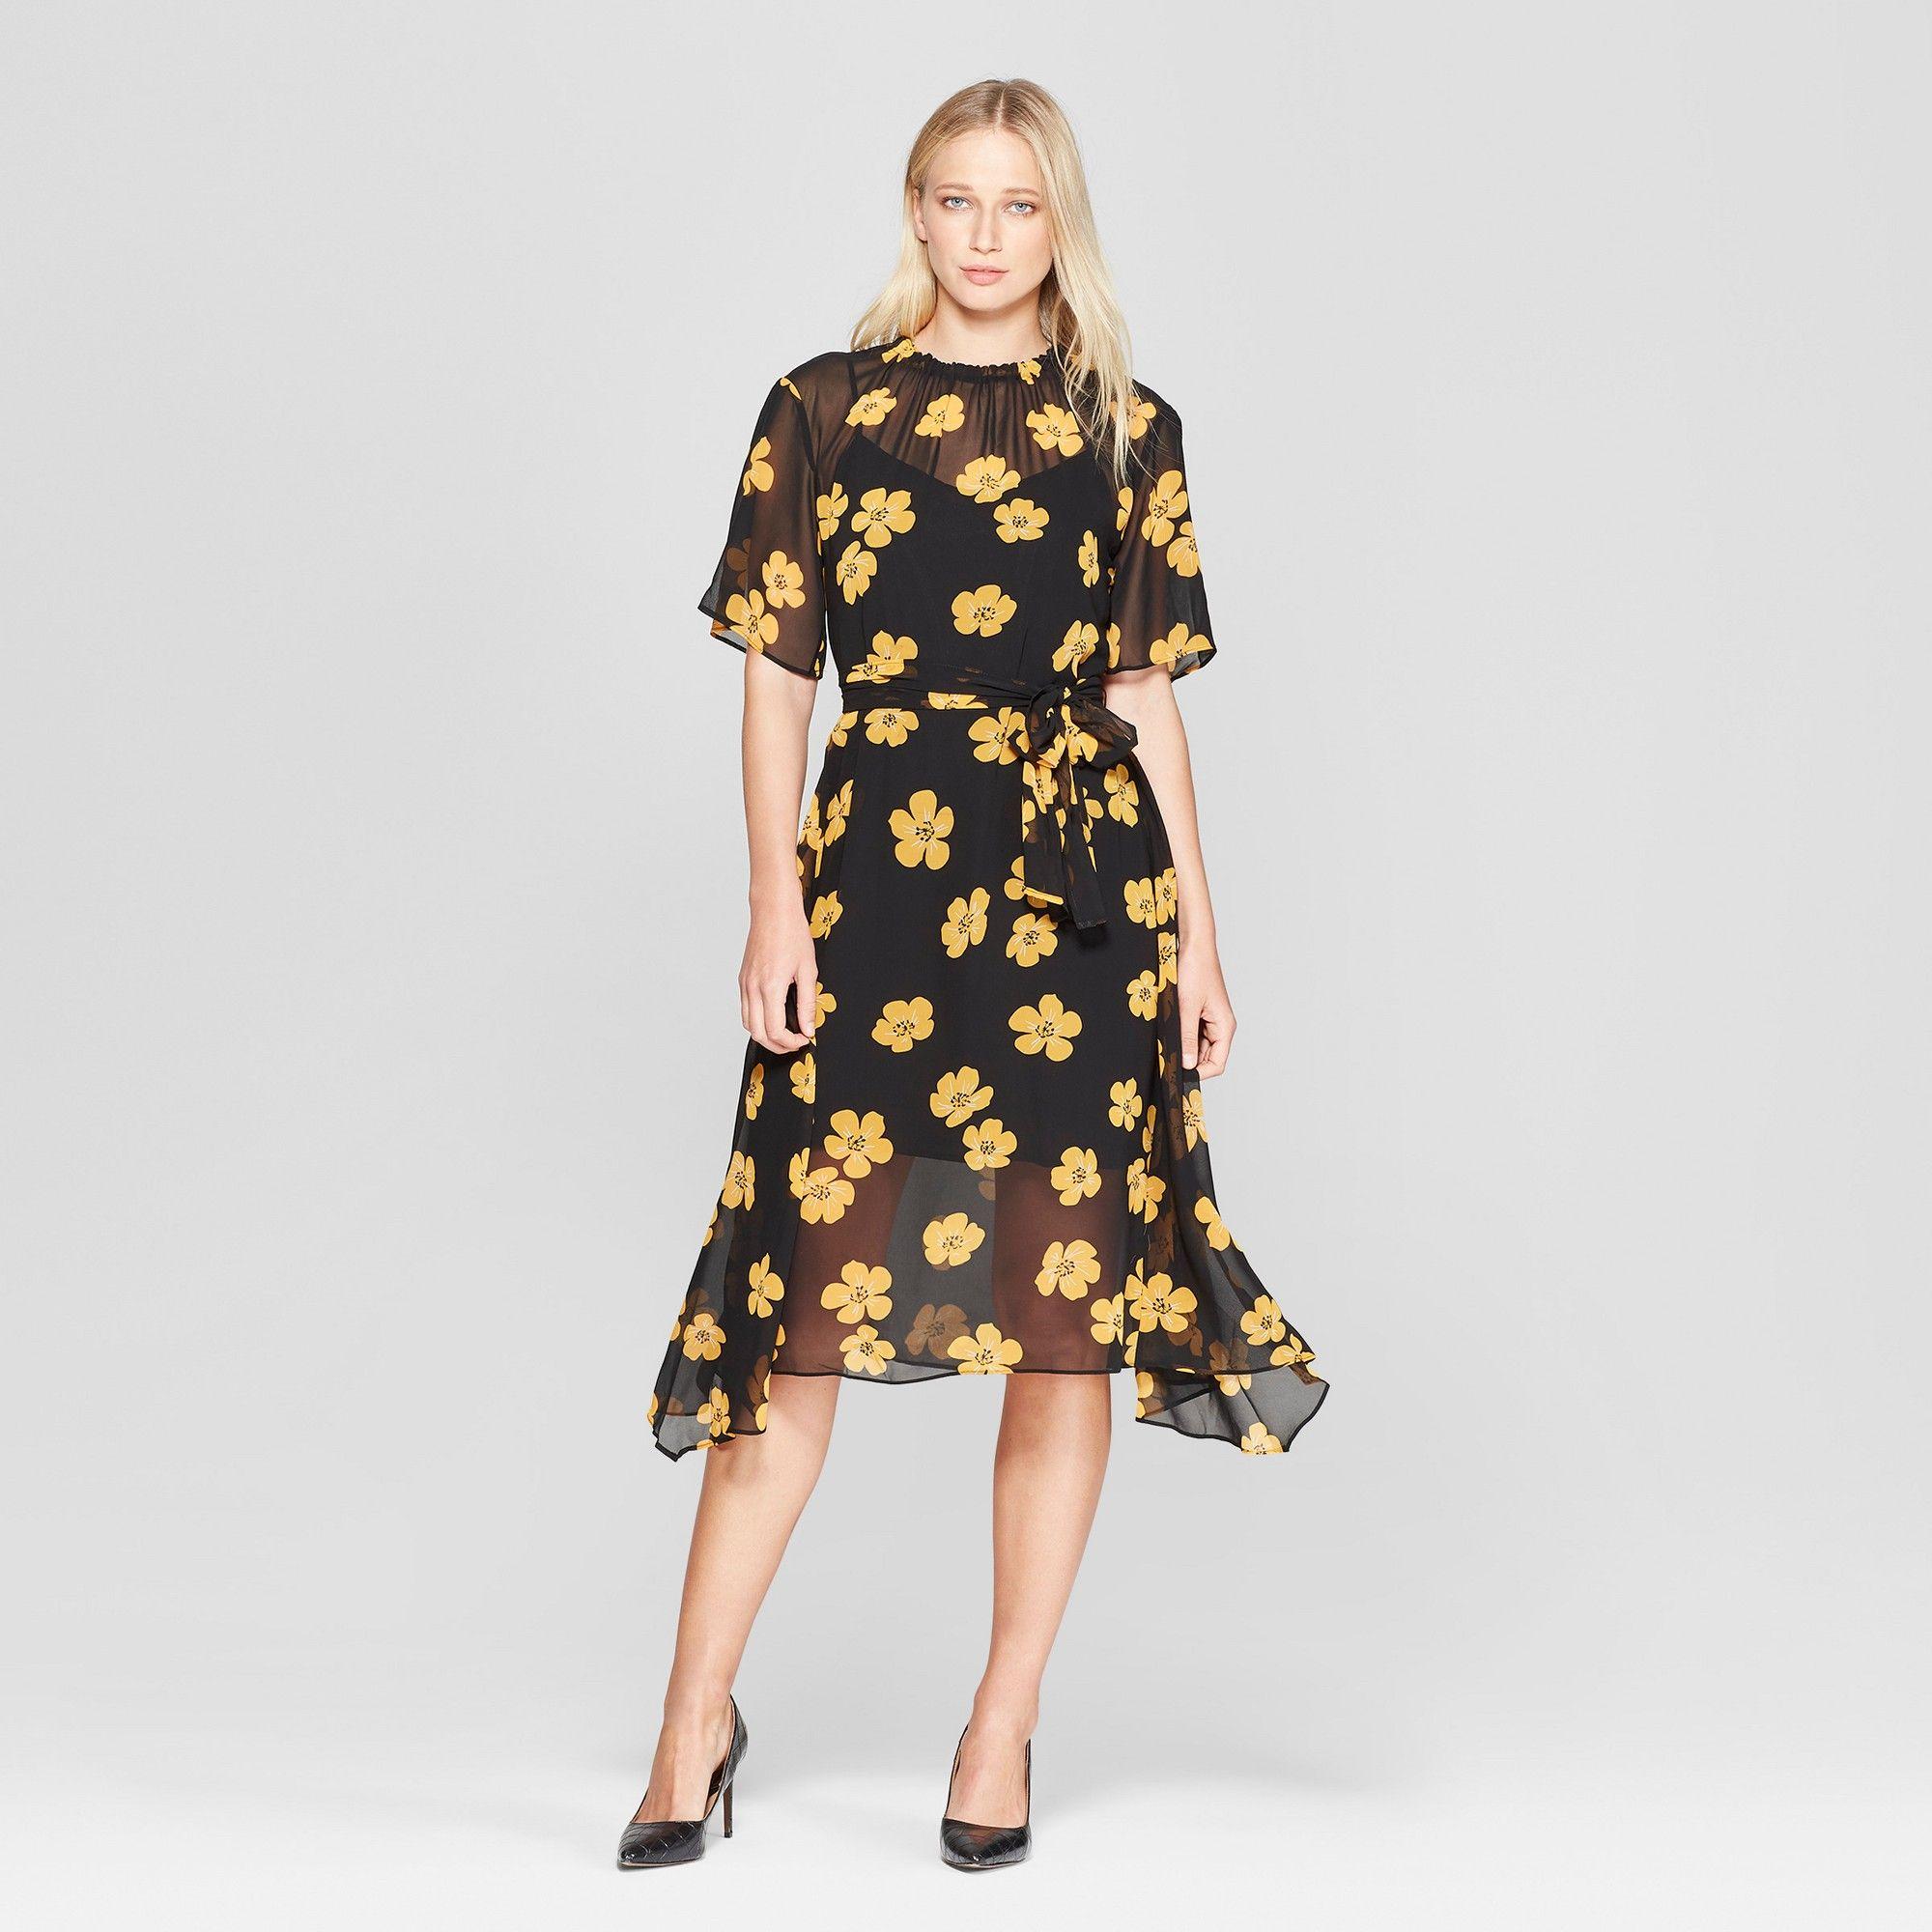 Women S Floral Print 3 4 Sleeve Belted Flowy Midi Dress Who What Wear Black Yellow M Flowy Midi Dress Chic Summer Dresses Dresses [ 2000 x 2000 Pixel ]